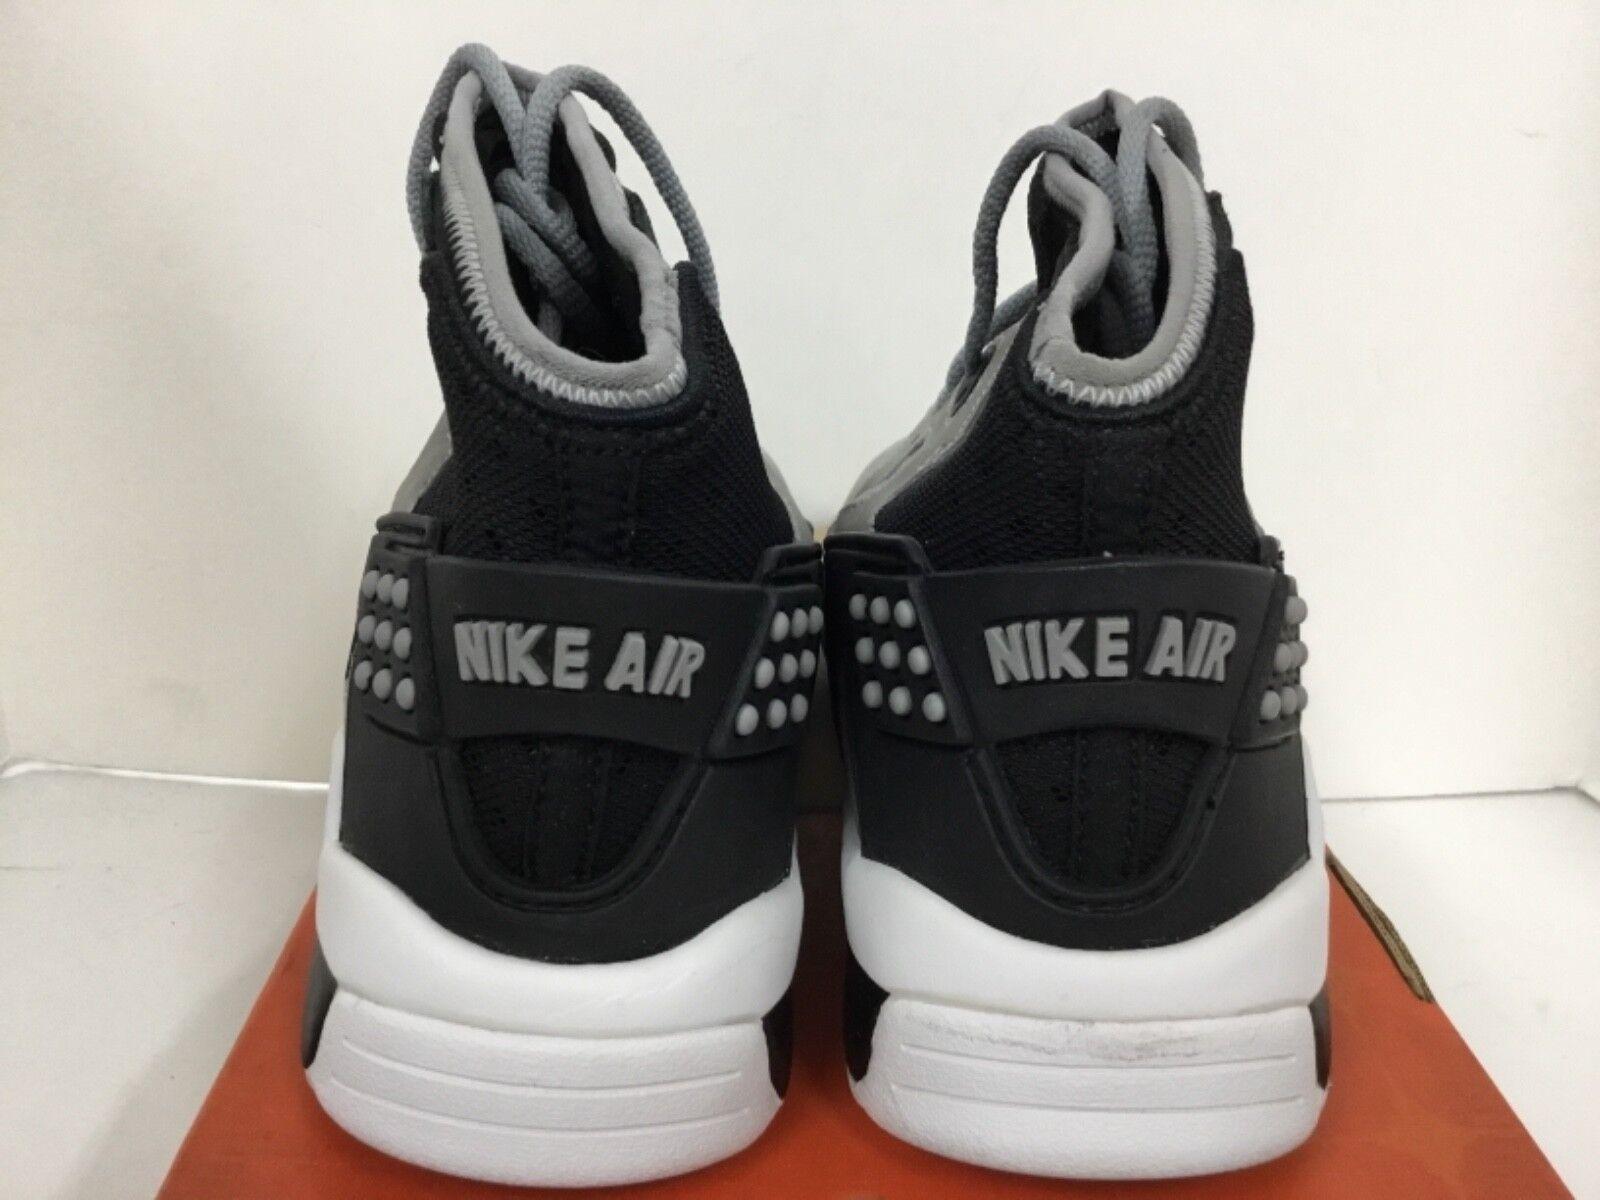 Nike Nike Nike air mowabb männer 312037 001 größe 8,5 f66753